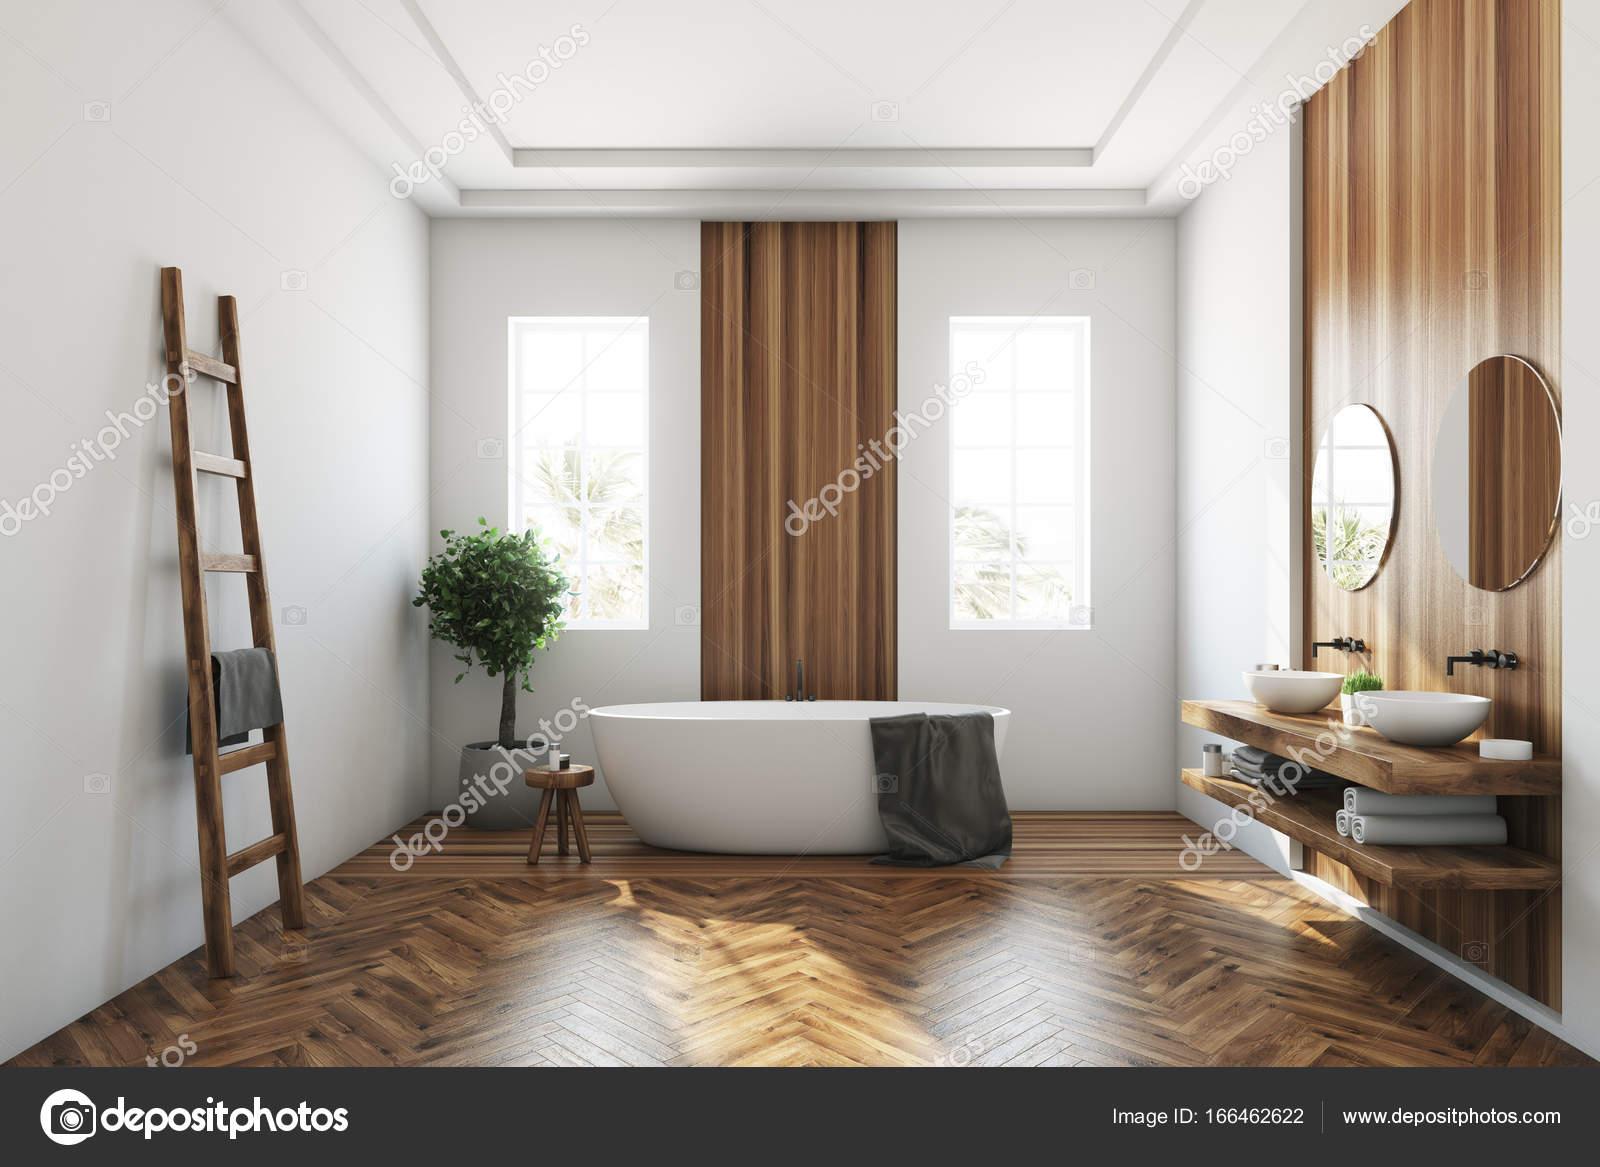 Vasca da bagno in legno e bianco, bianco — Foto Stock ...